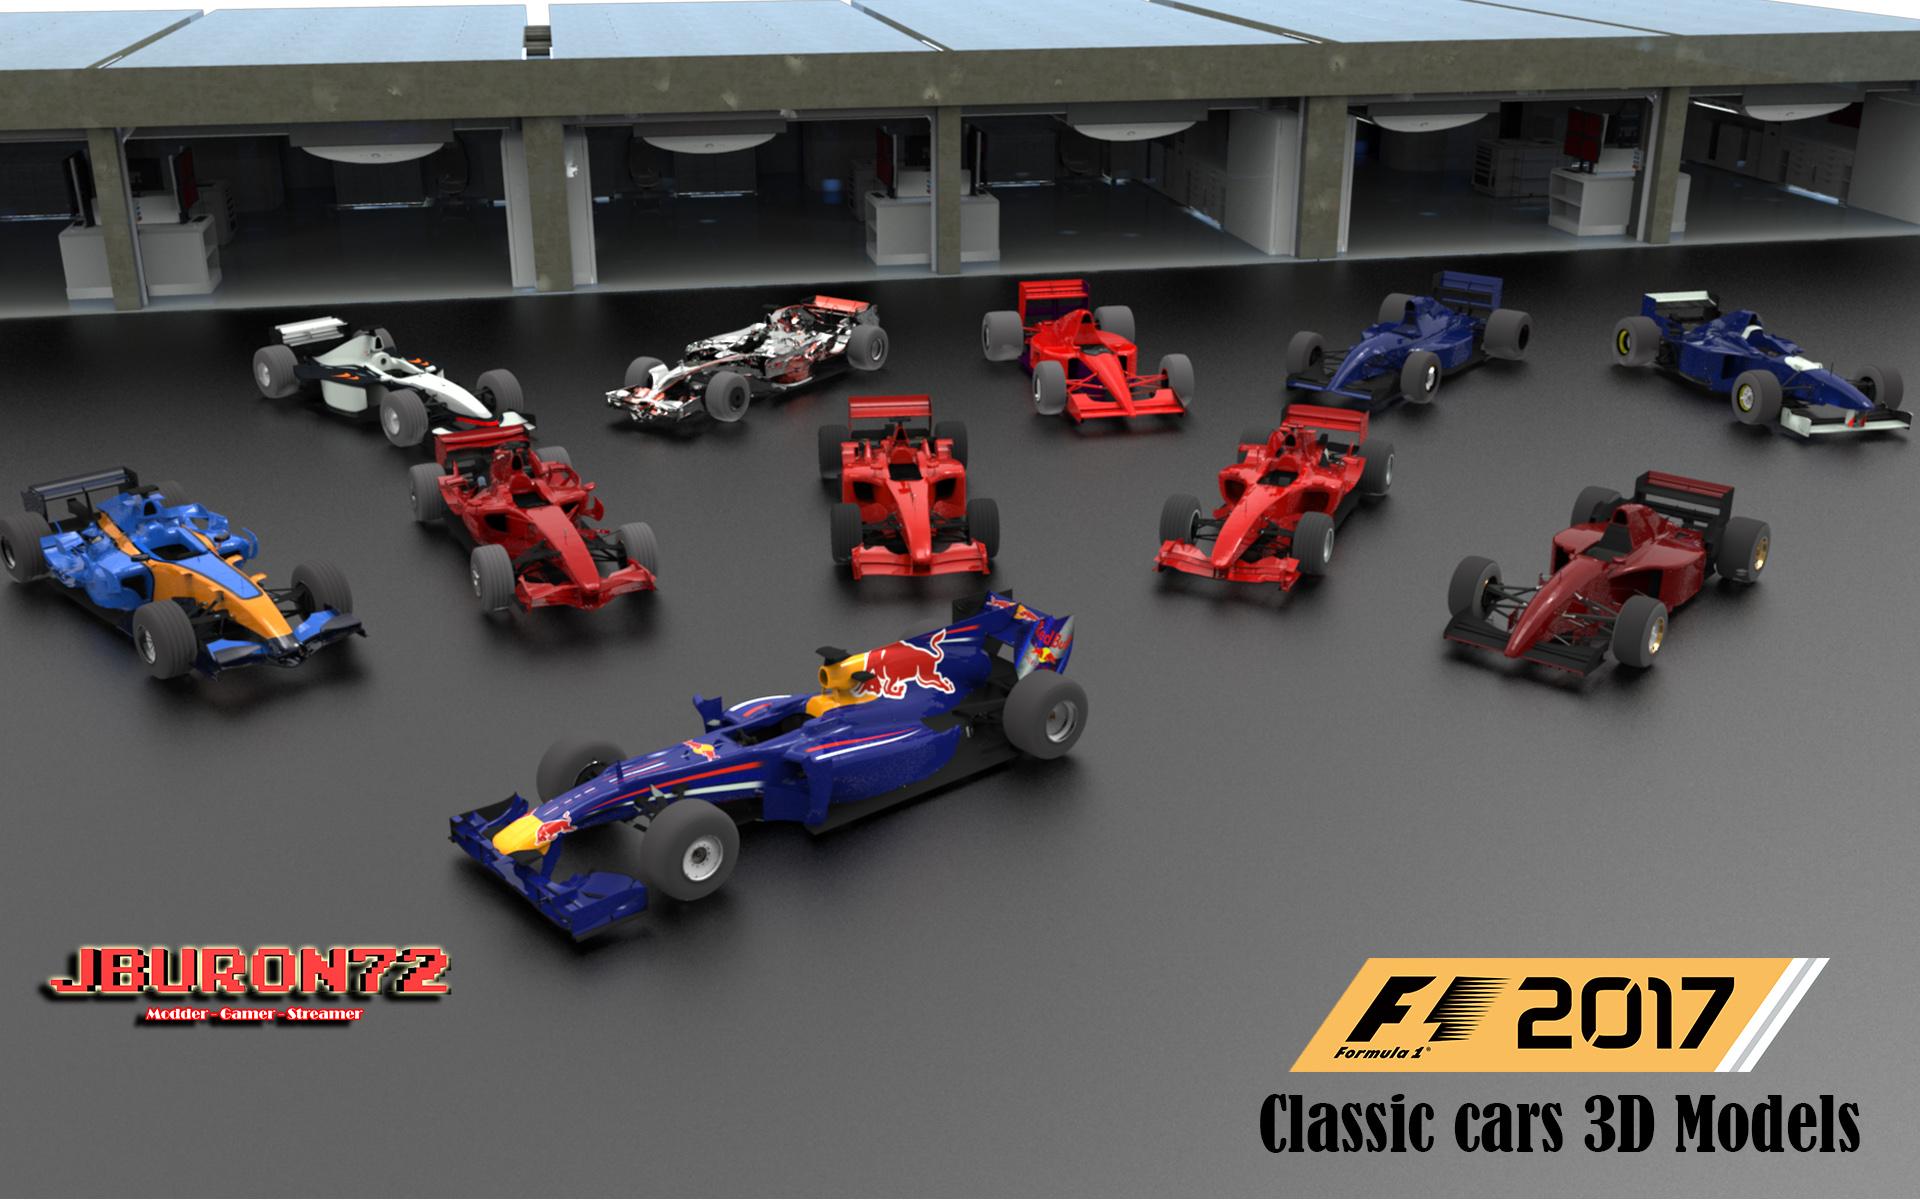 17 classic cars.56.jpg